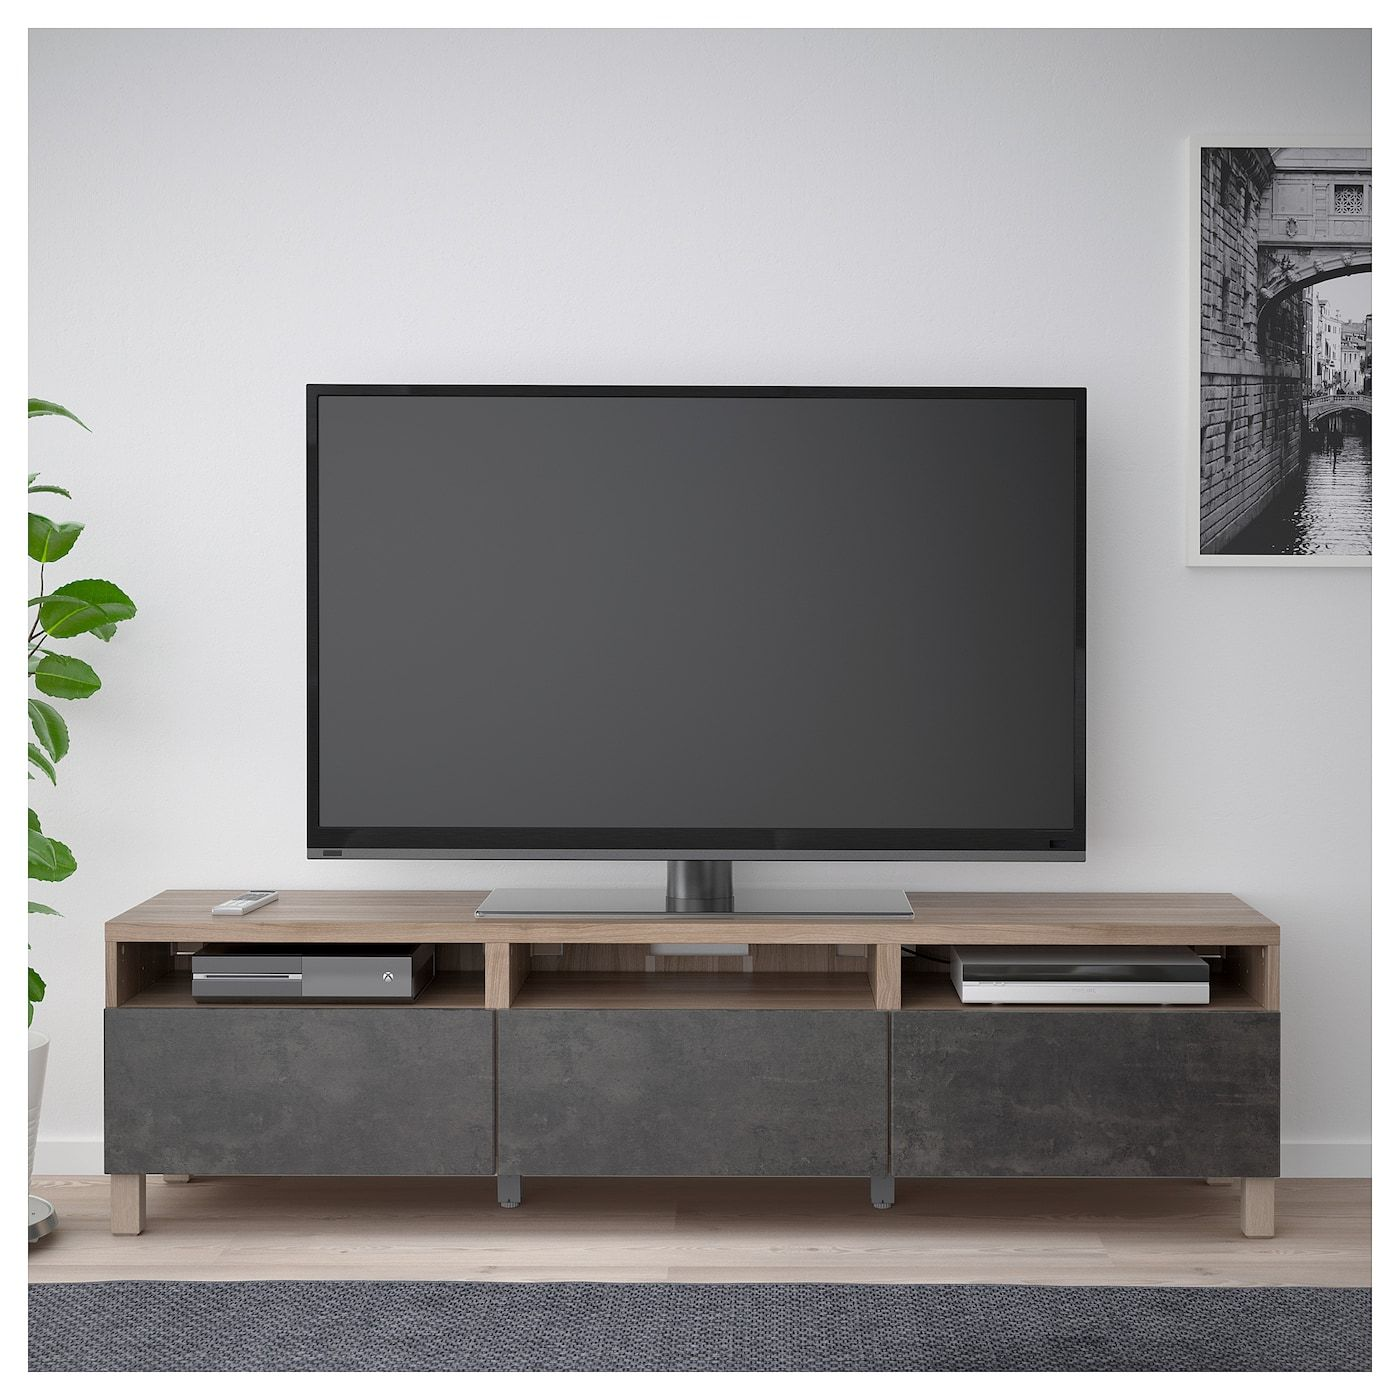 Us Furniture And Home Furnishings Tv Mobel Schubladen Und Ikea